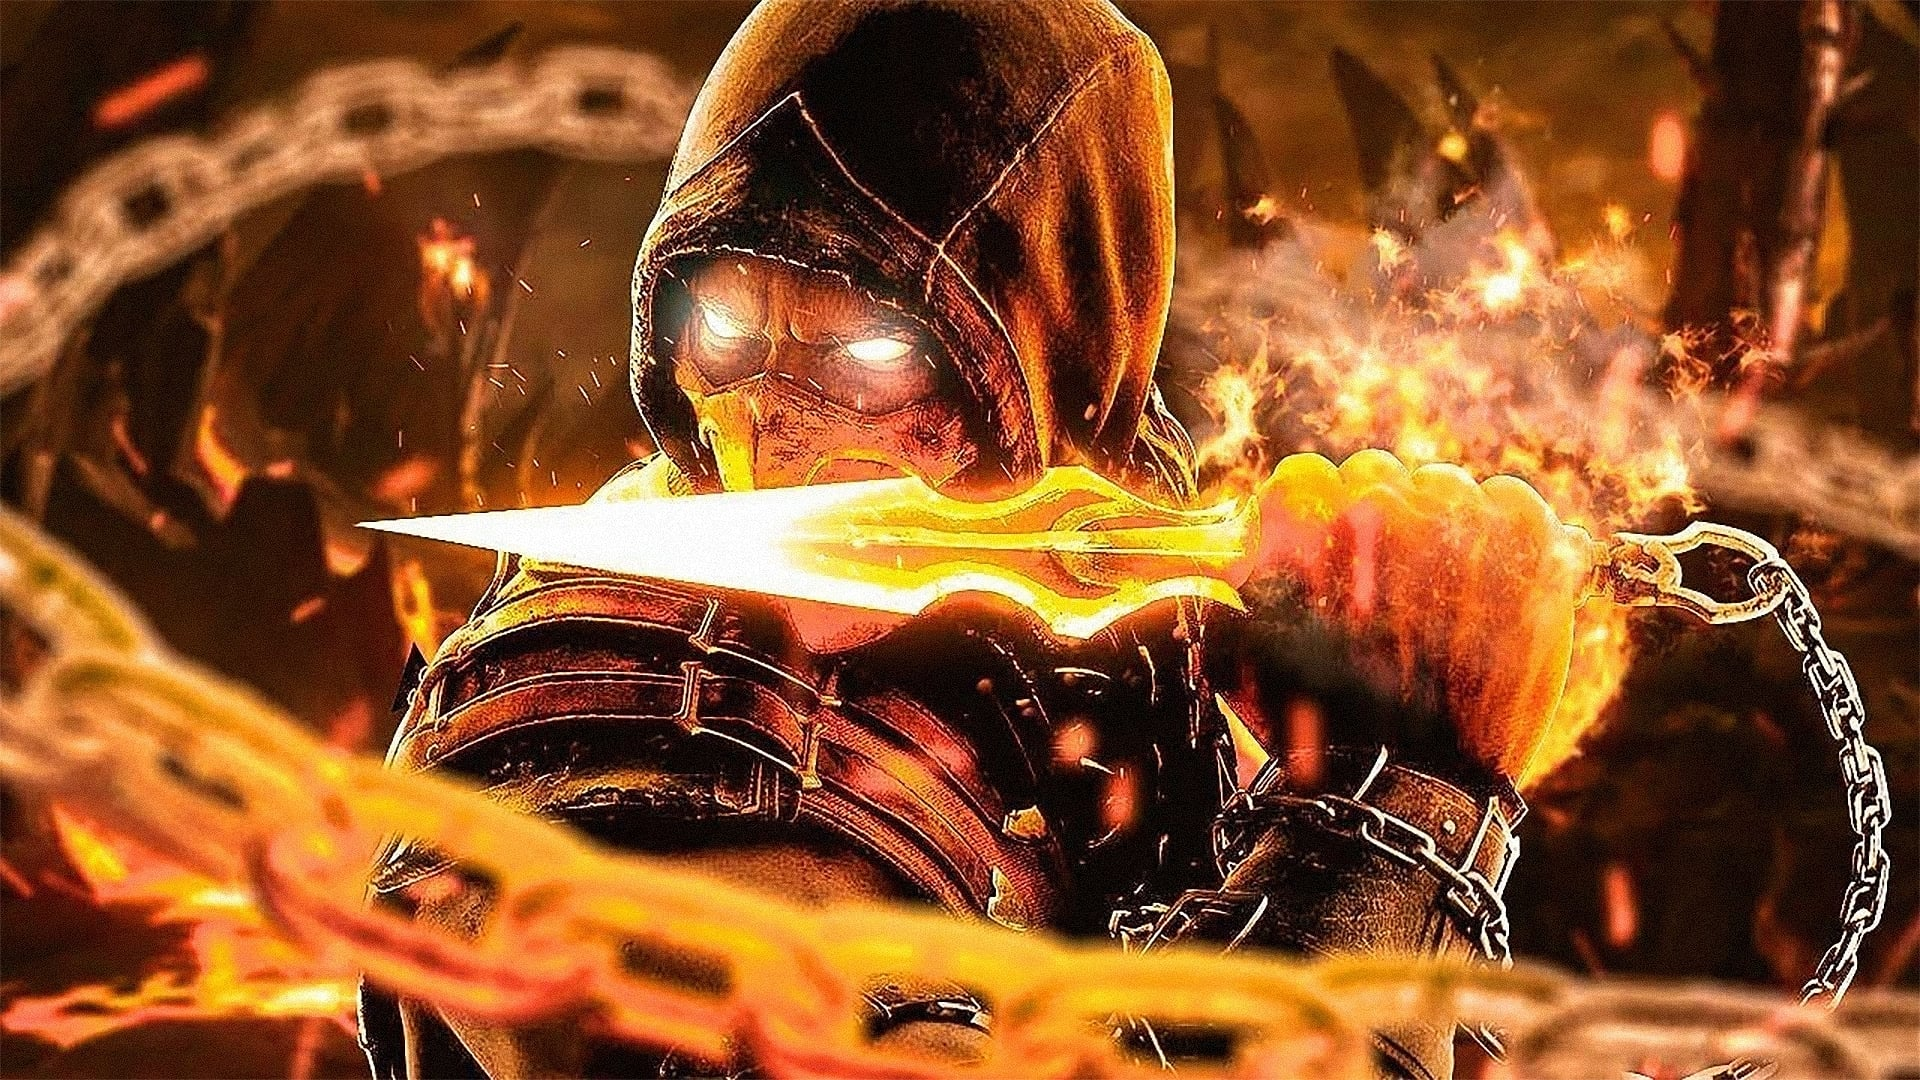 Mortal Kombat Legends: Scorpion's Revenge Trailer